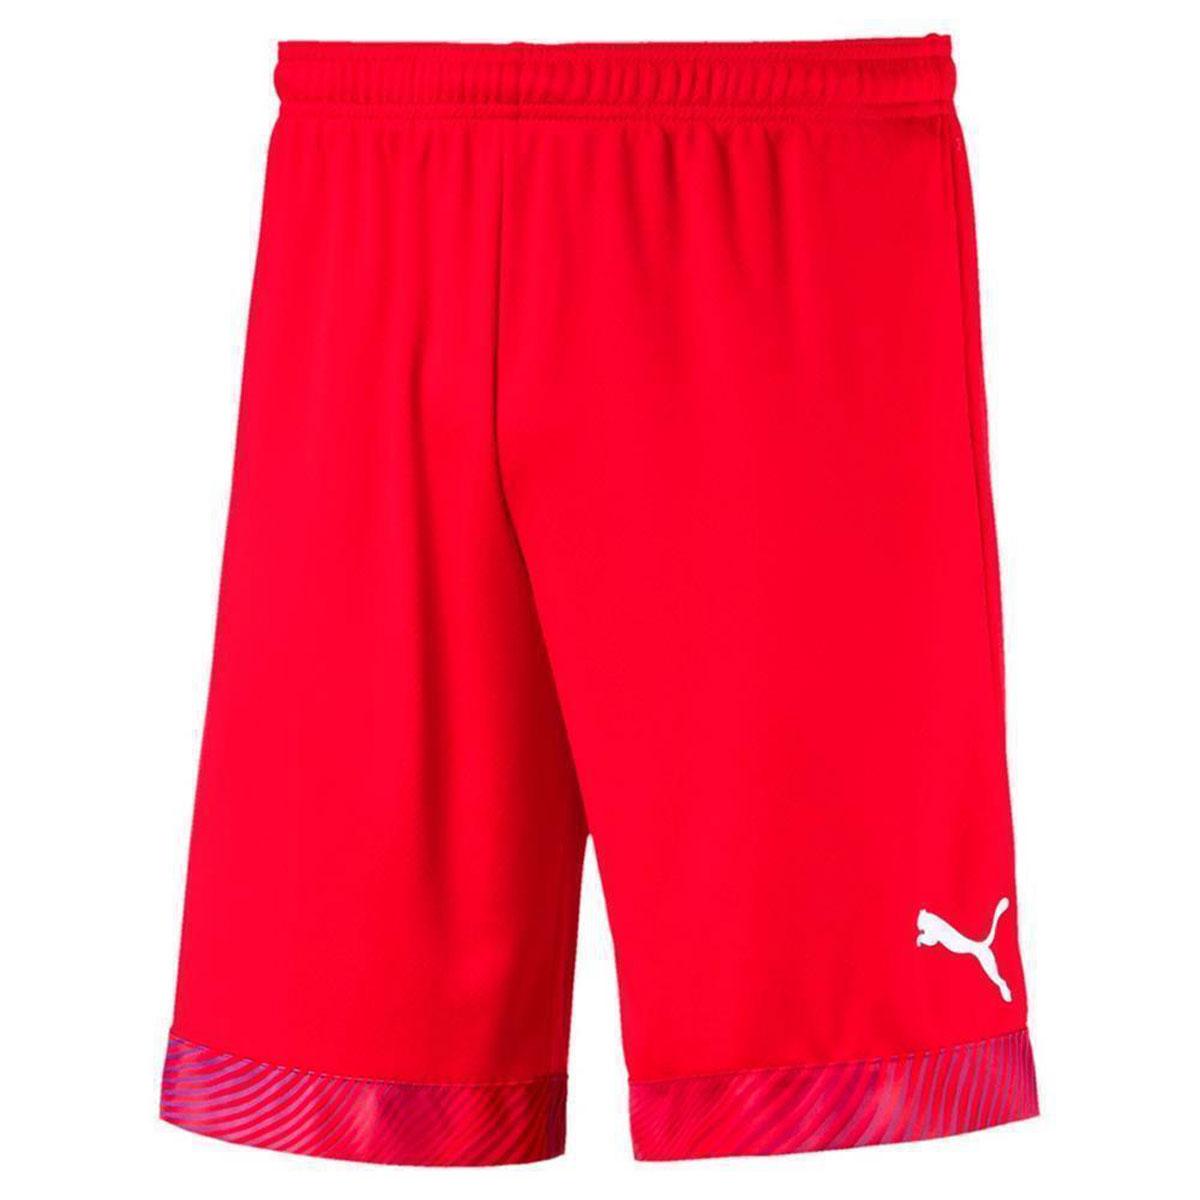 Men's Cup Short, Red, swatch